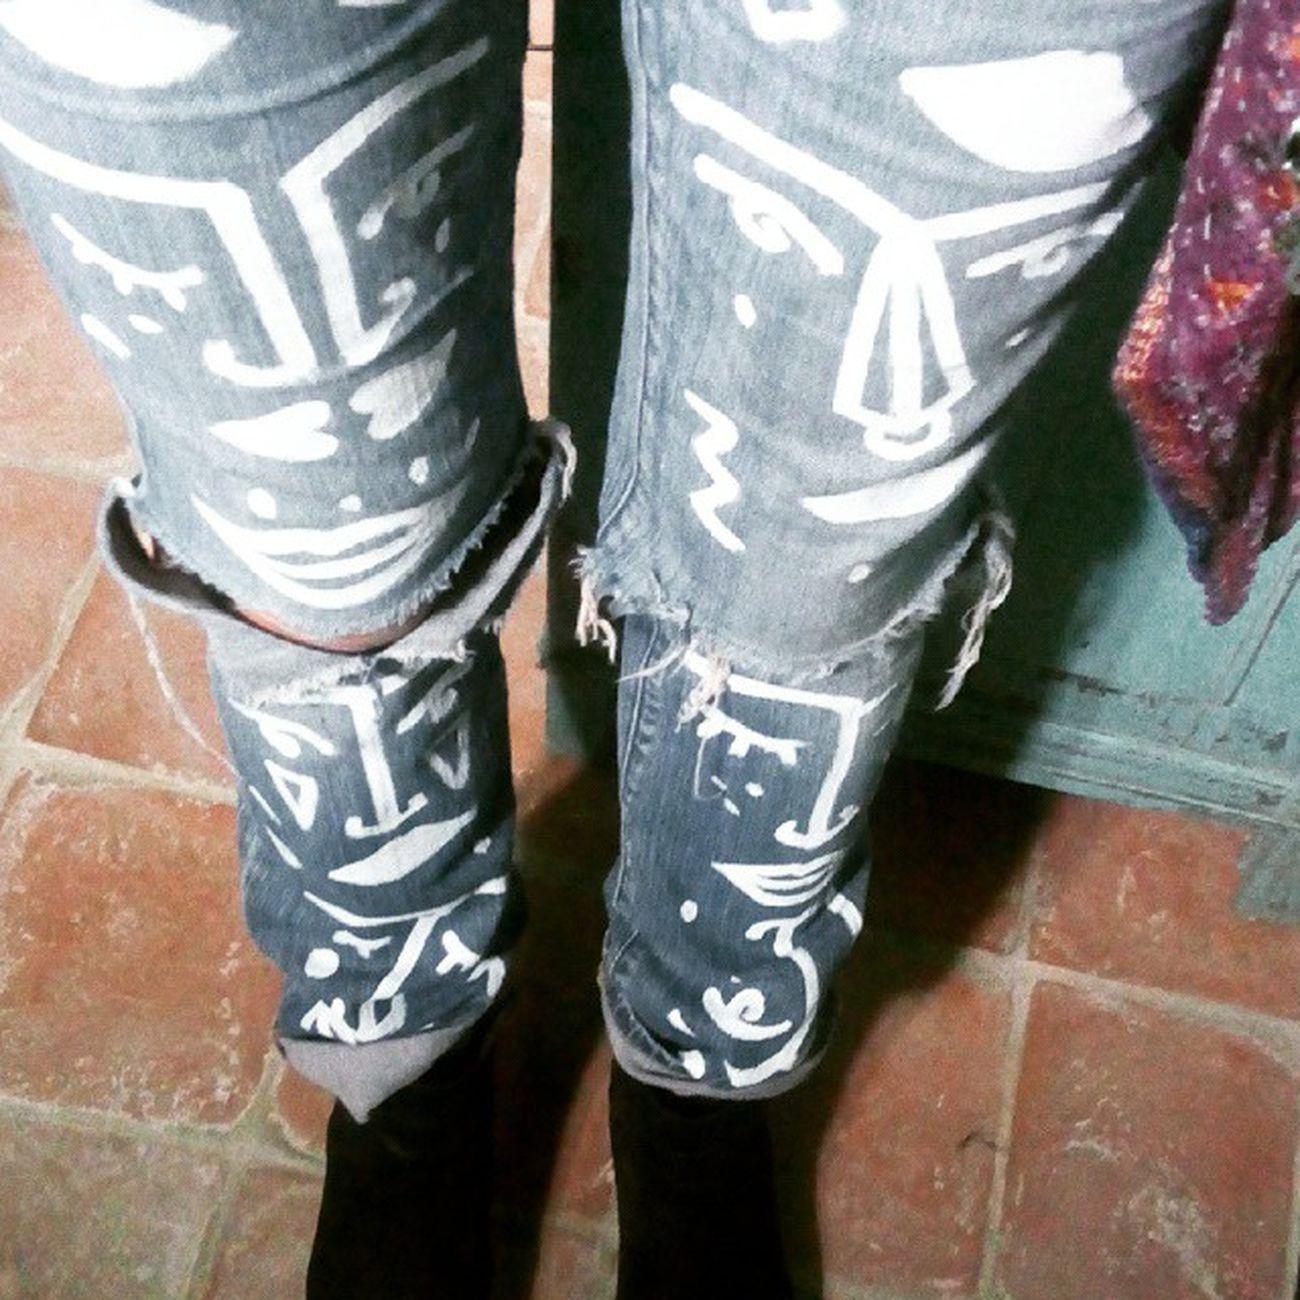 Handpainted jeans Jeans HandPainted Levis Pimp dipintiamano illustration oneofone pezziunici personalizzazione